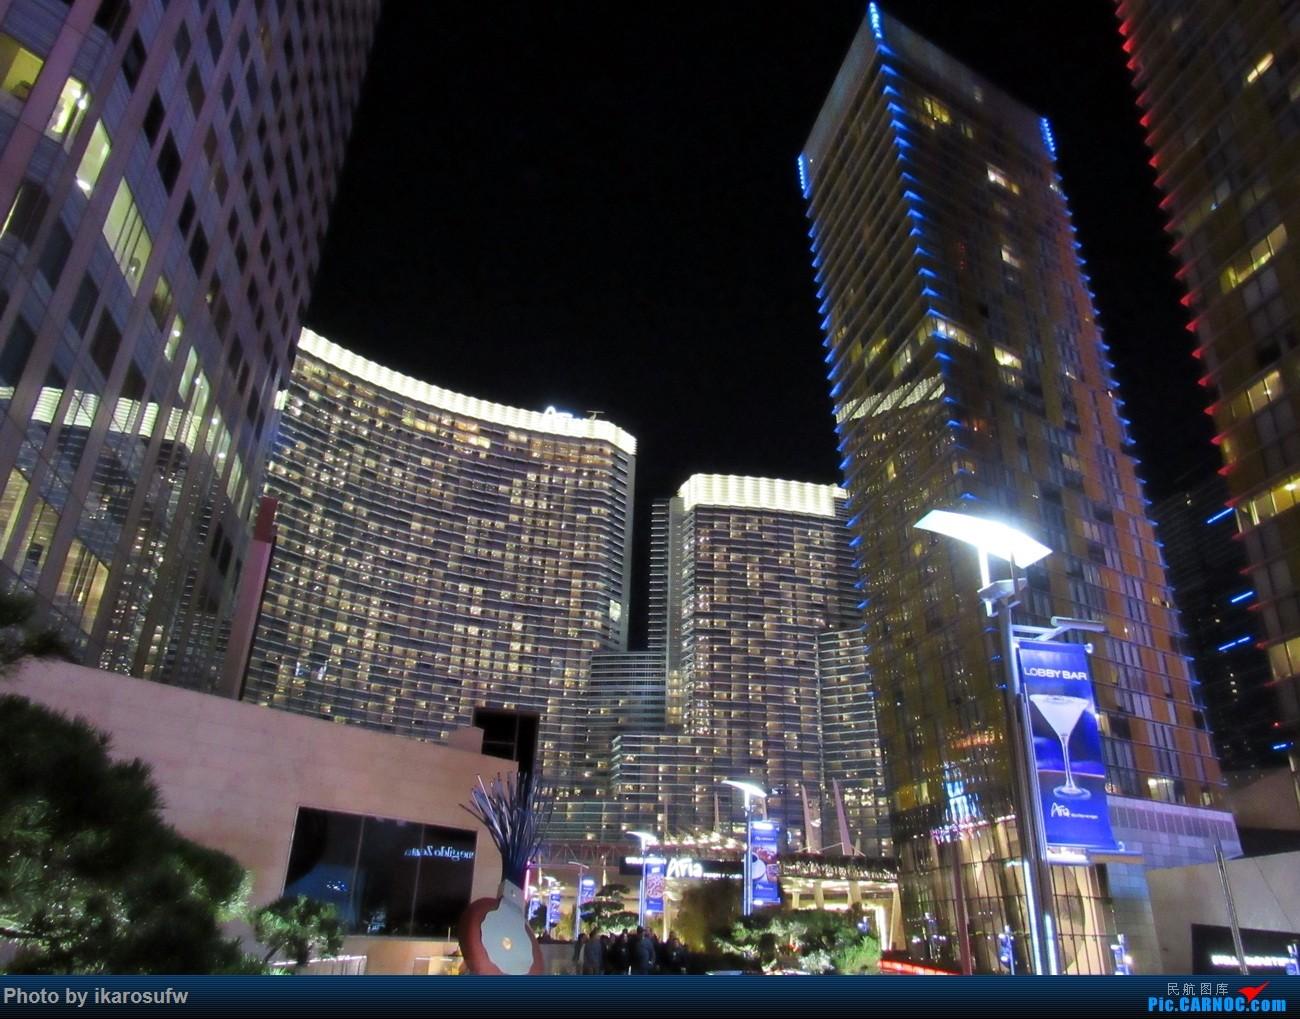 Re:[原创]圣诞节新年 新加坡北京旧金山/洛杉矶北京新加坡往返全记录及美西20日之旅 中国国际航空 CA970/985/988/975(三)